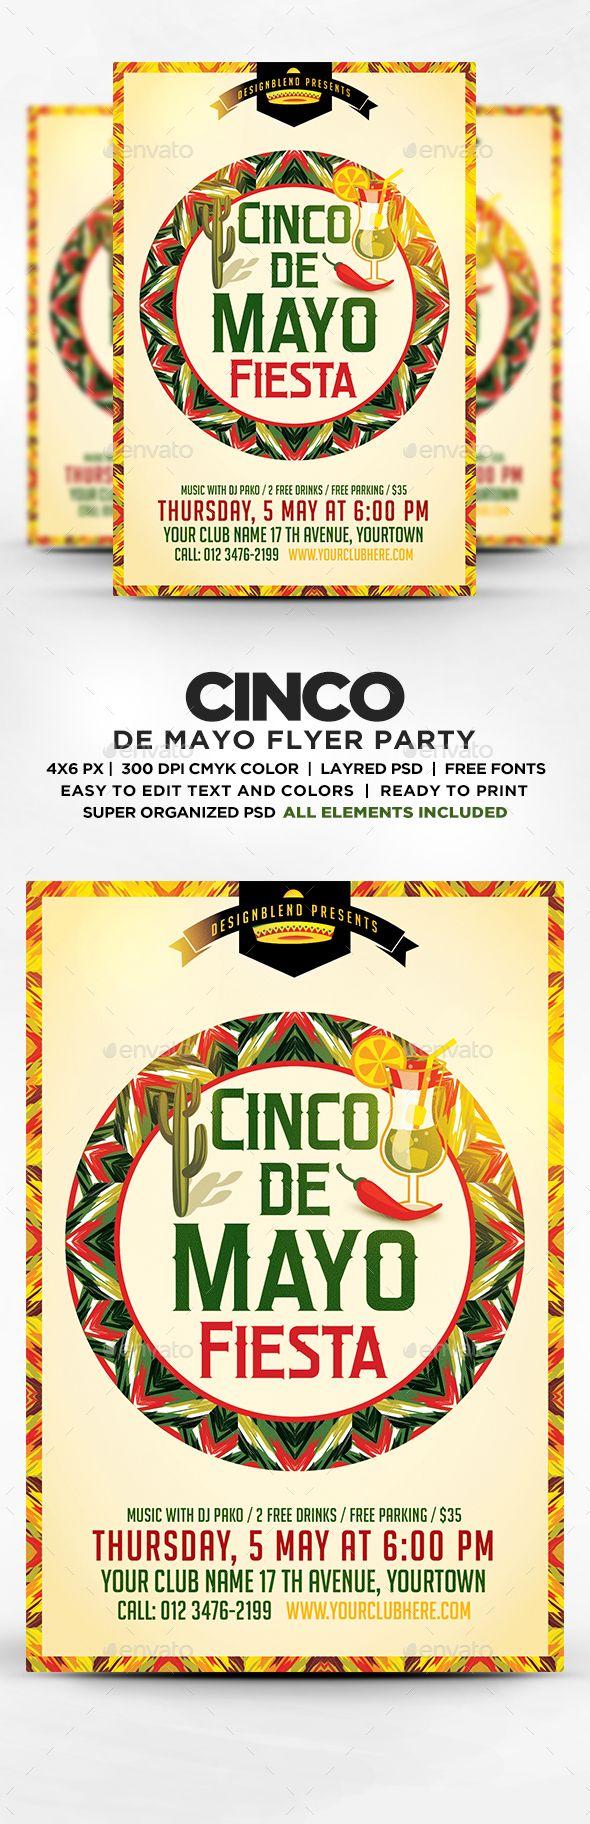 Cinco De Mayo Celebration Flyer Template PSD. Download here: http://graphicriver.net/item/cinco-de-mayo-celebration-flyer-template-psd/15903804?ref=ksioks